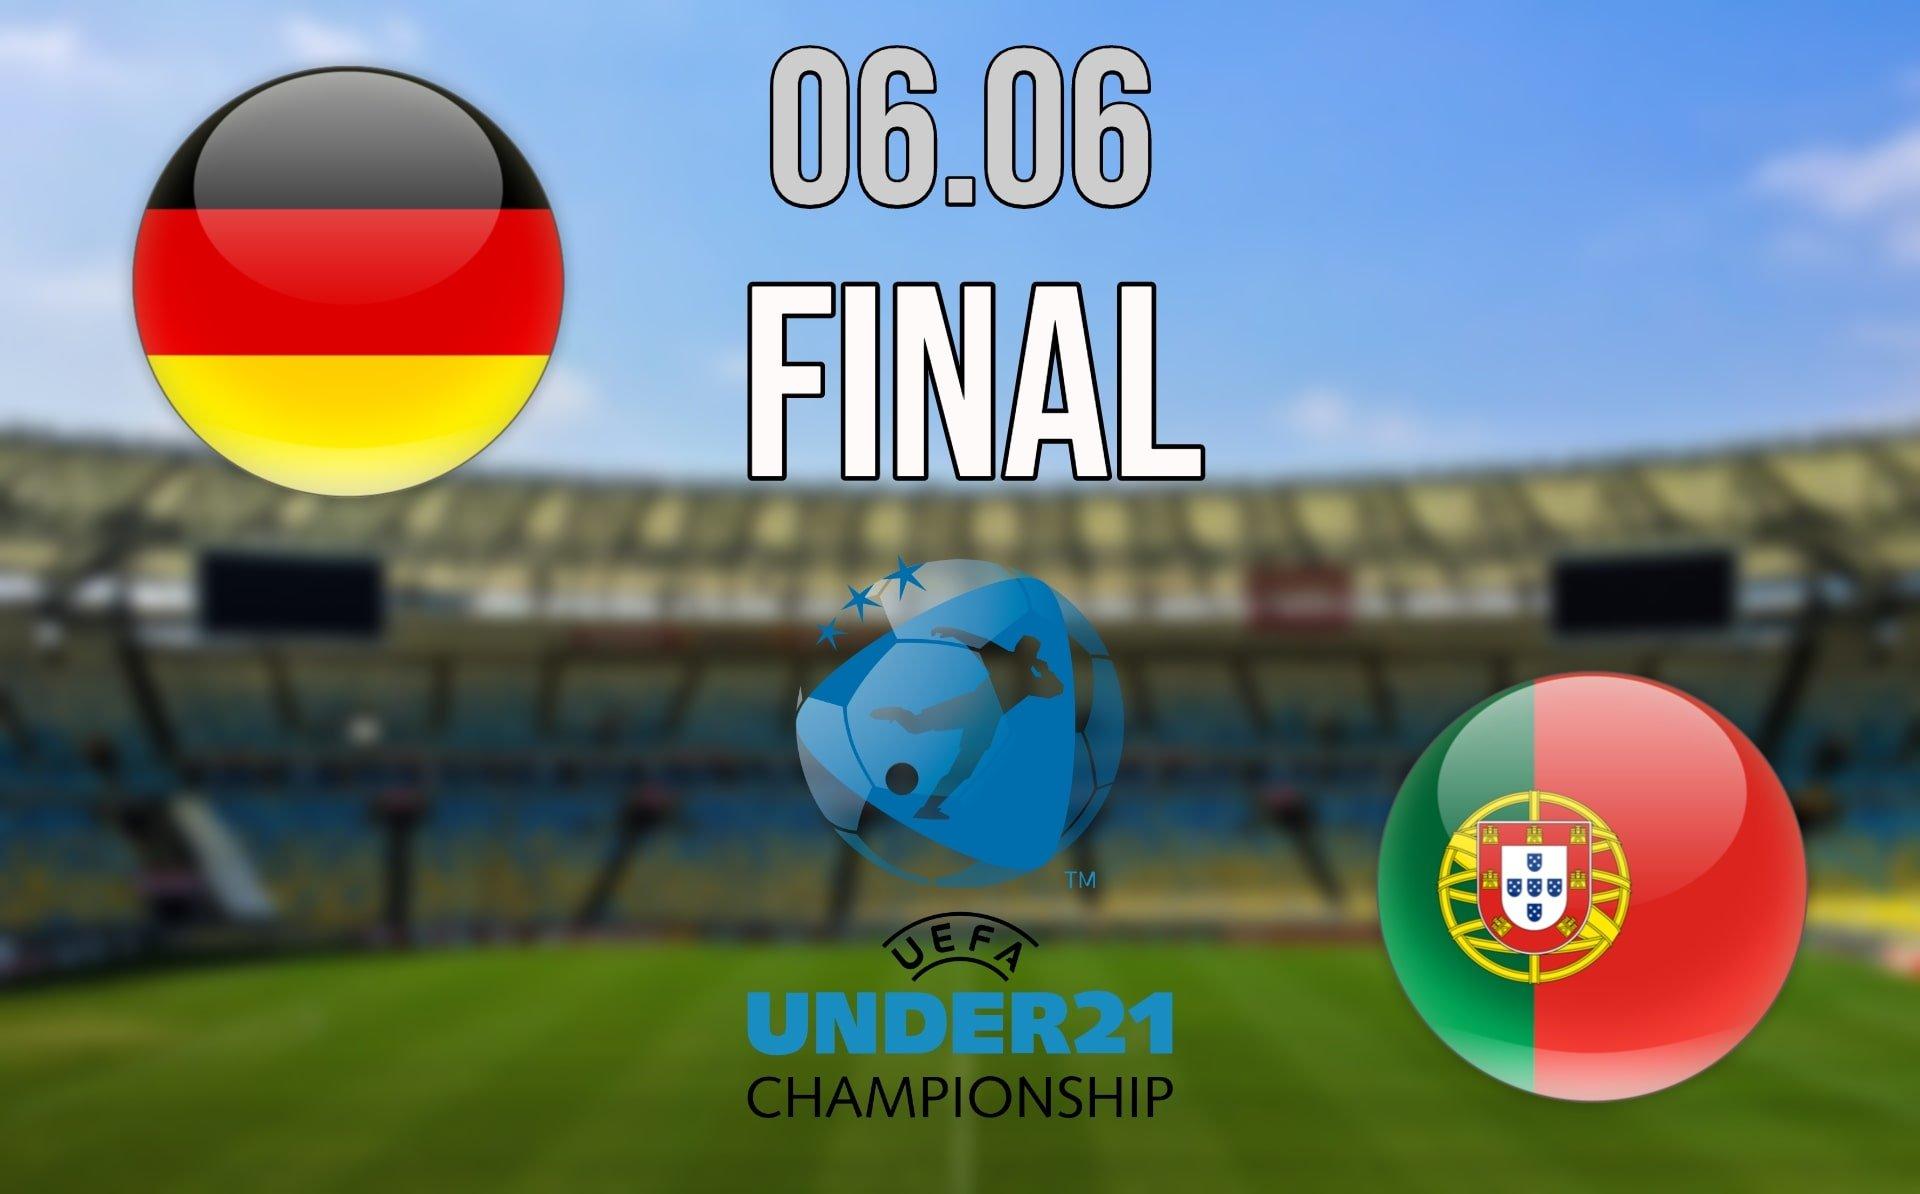 EURO U21 Final Prediction: Germany vs Portugal Match on 06.06.2021